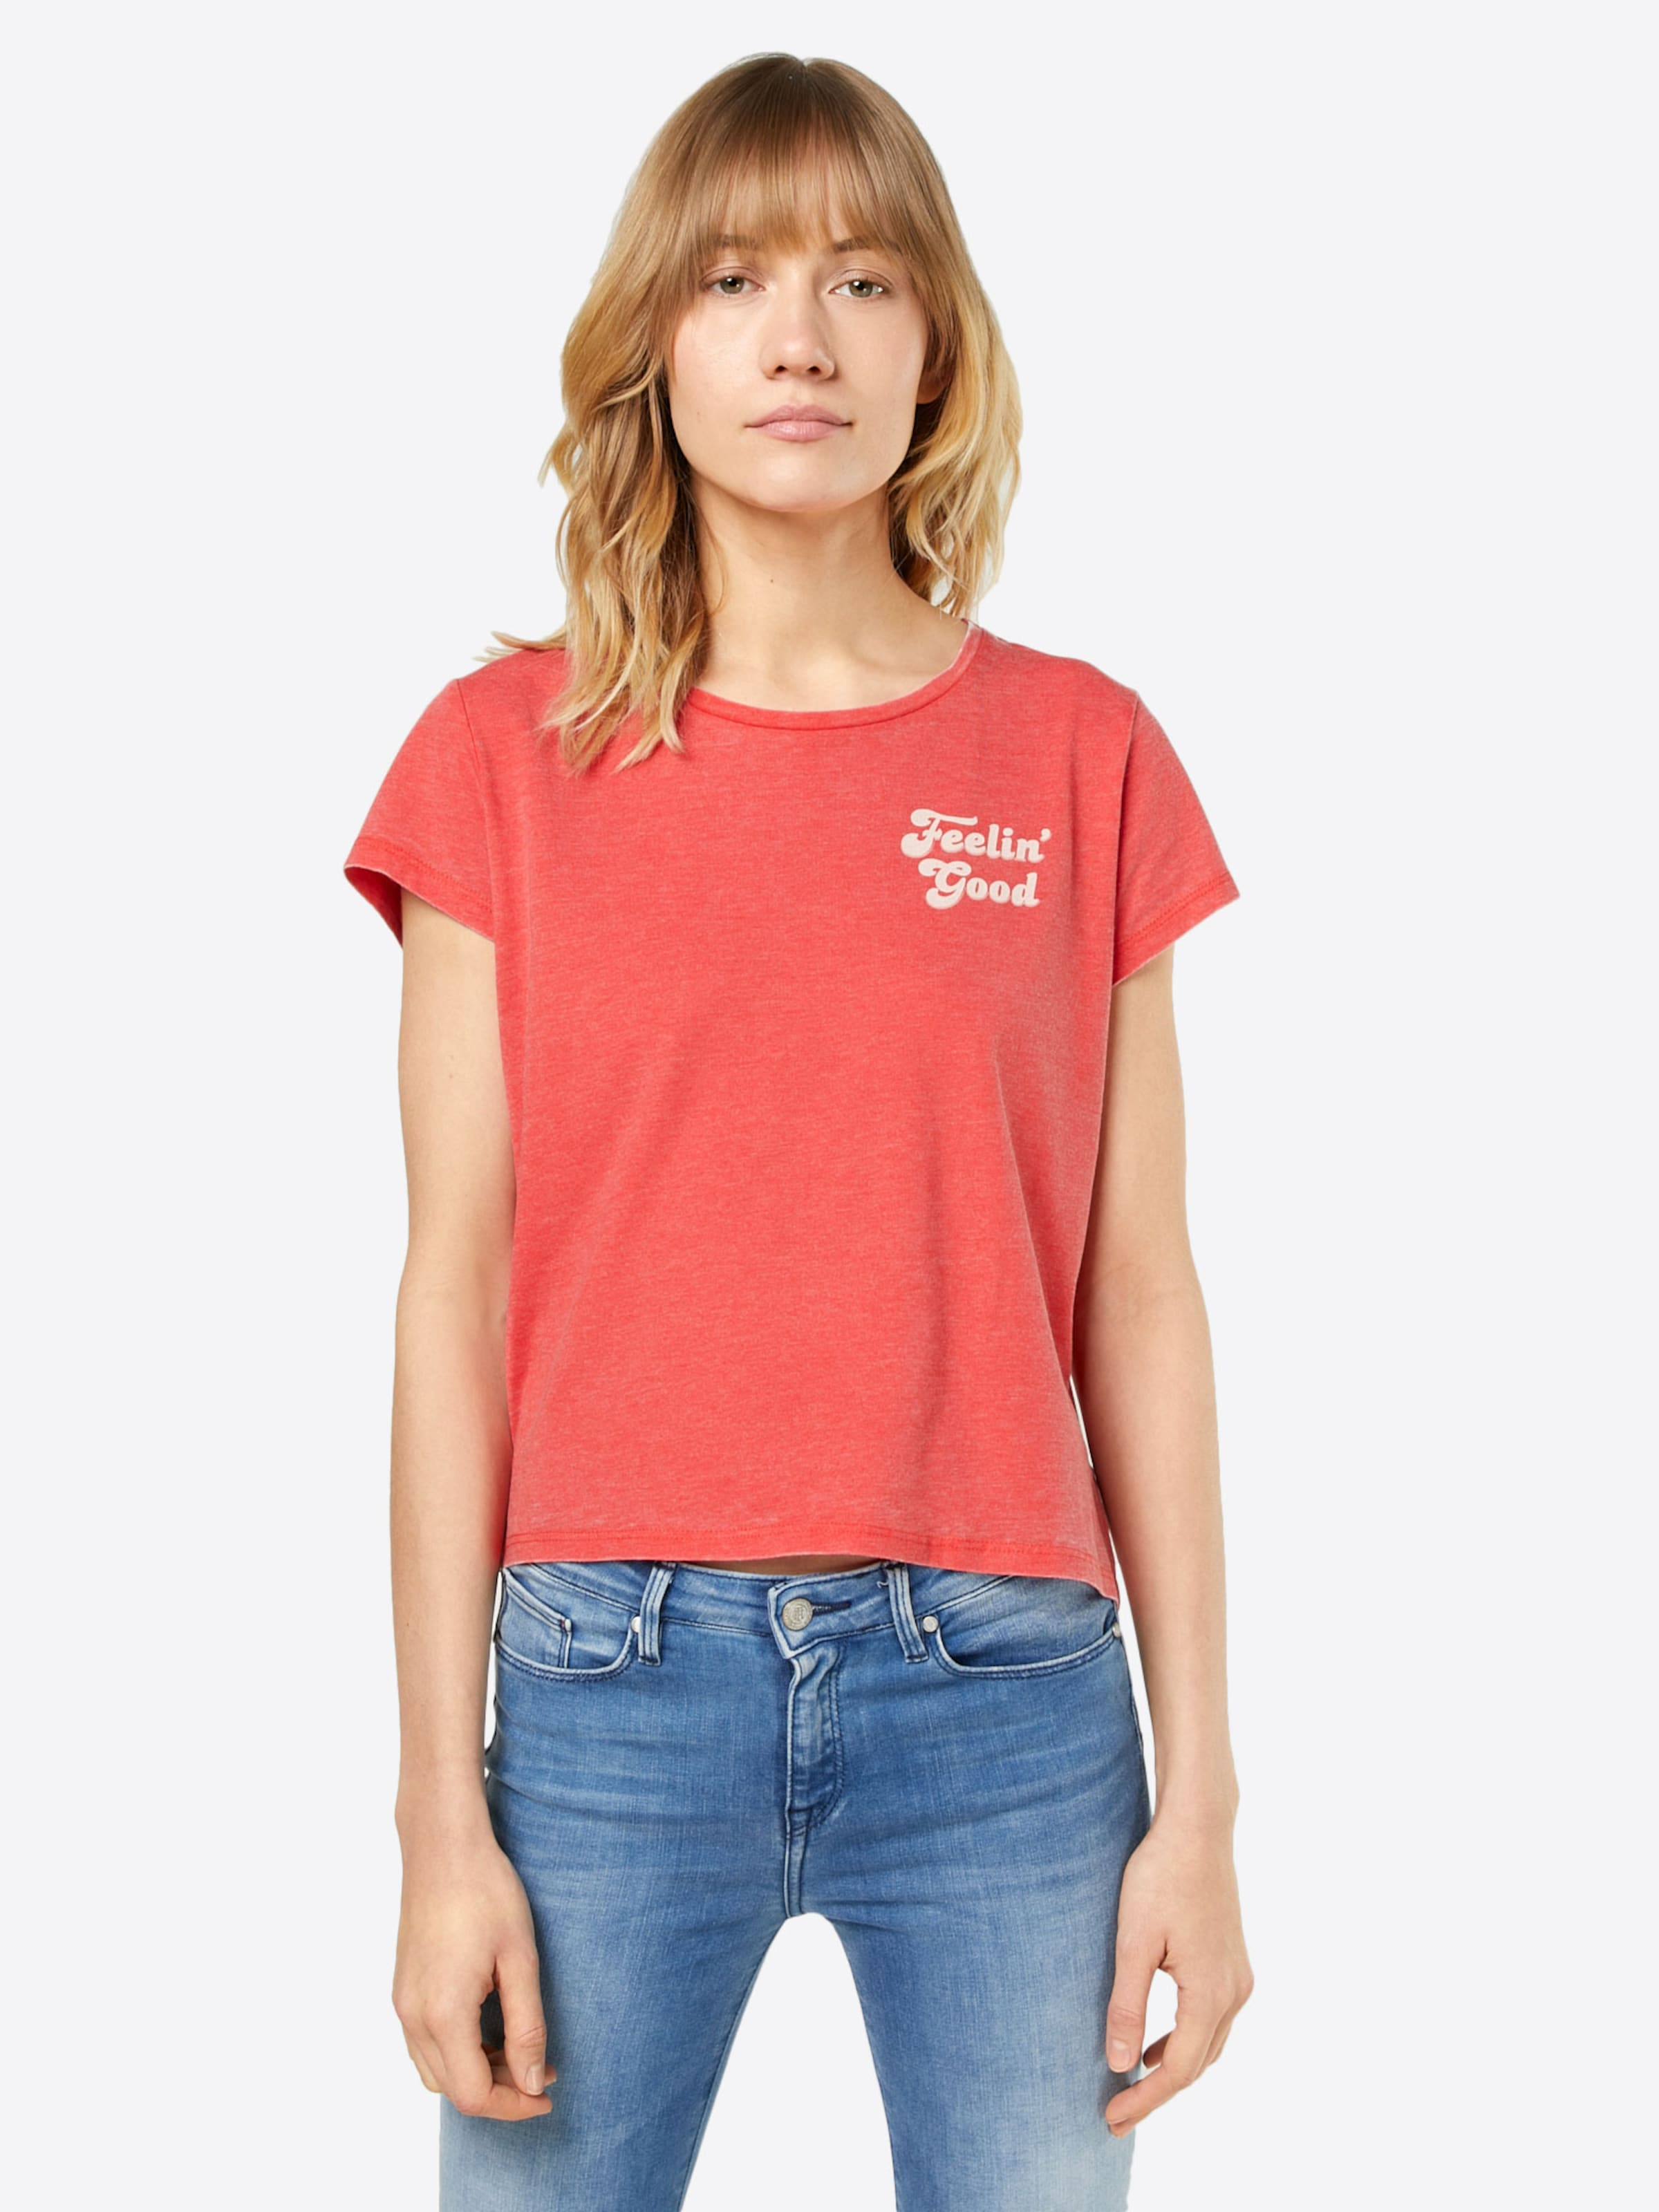 Billig Verkauf Beste Preise ONLY T-Shirt 'EMMA' Steckdose Erkunden 7cIyhGNn